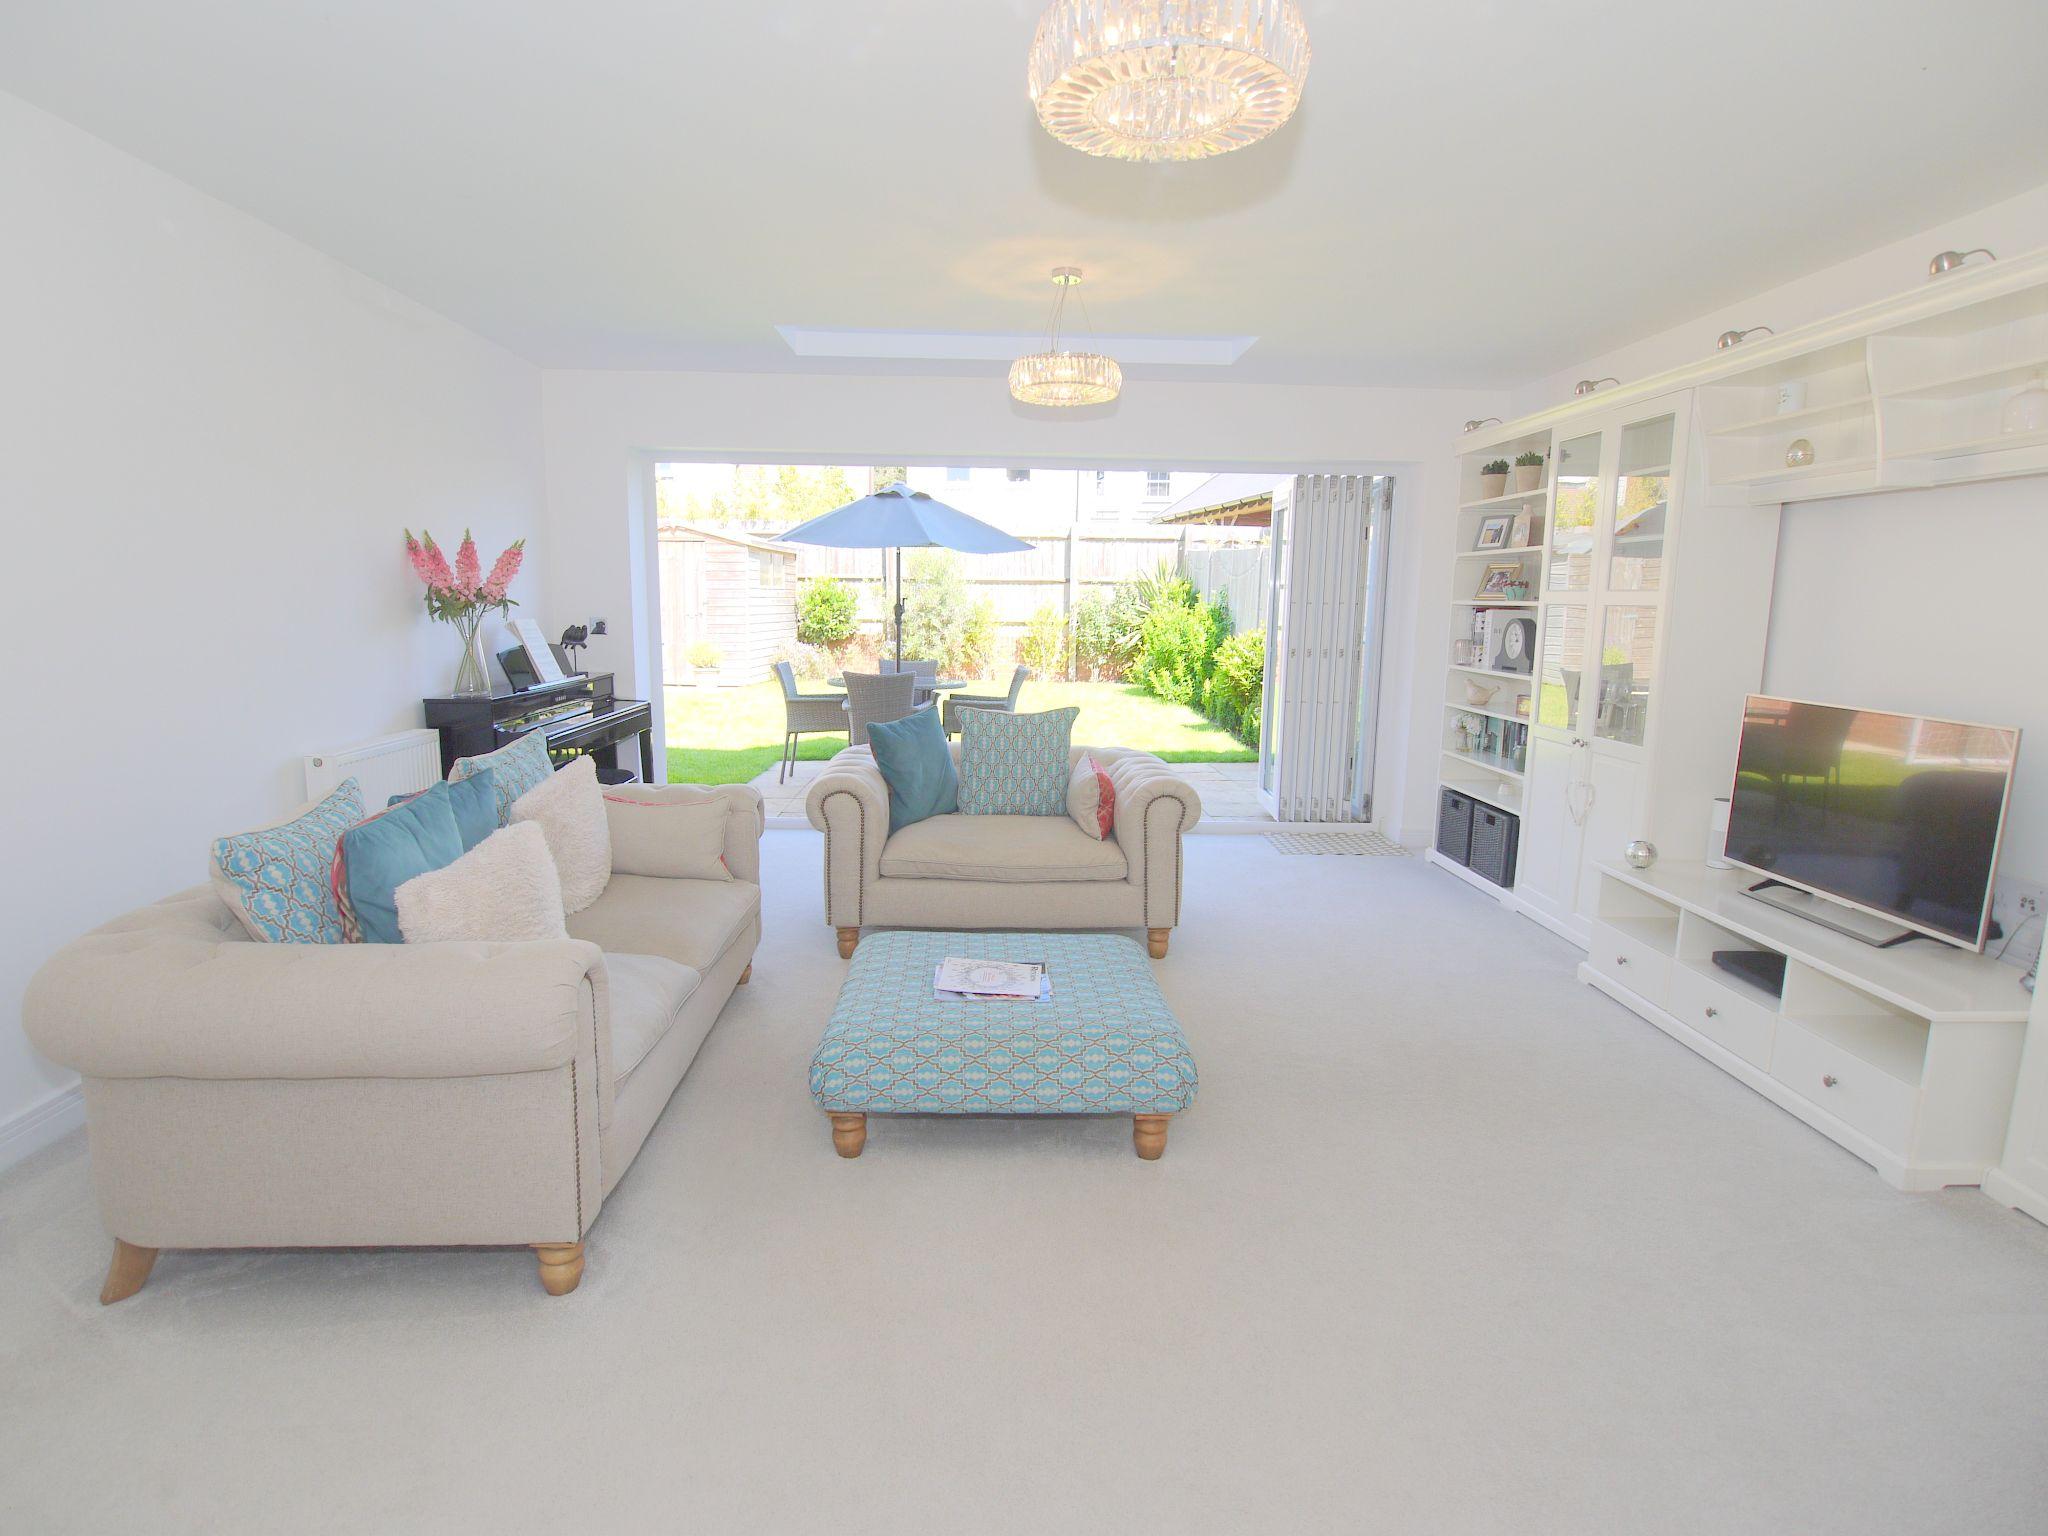 5 bedroom semi-detached house For Sale in Tonbridge - Photograph 2